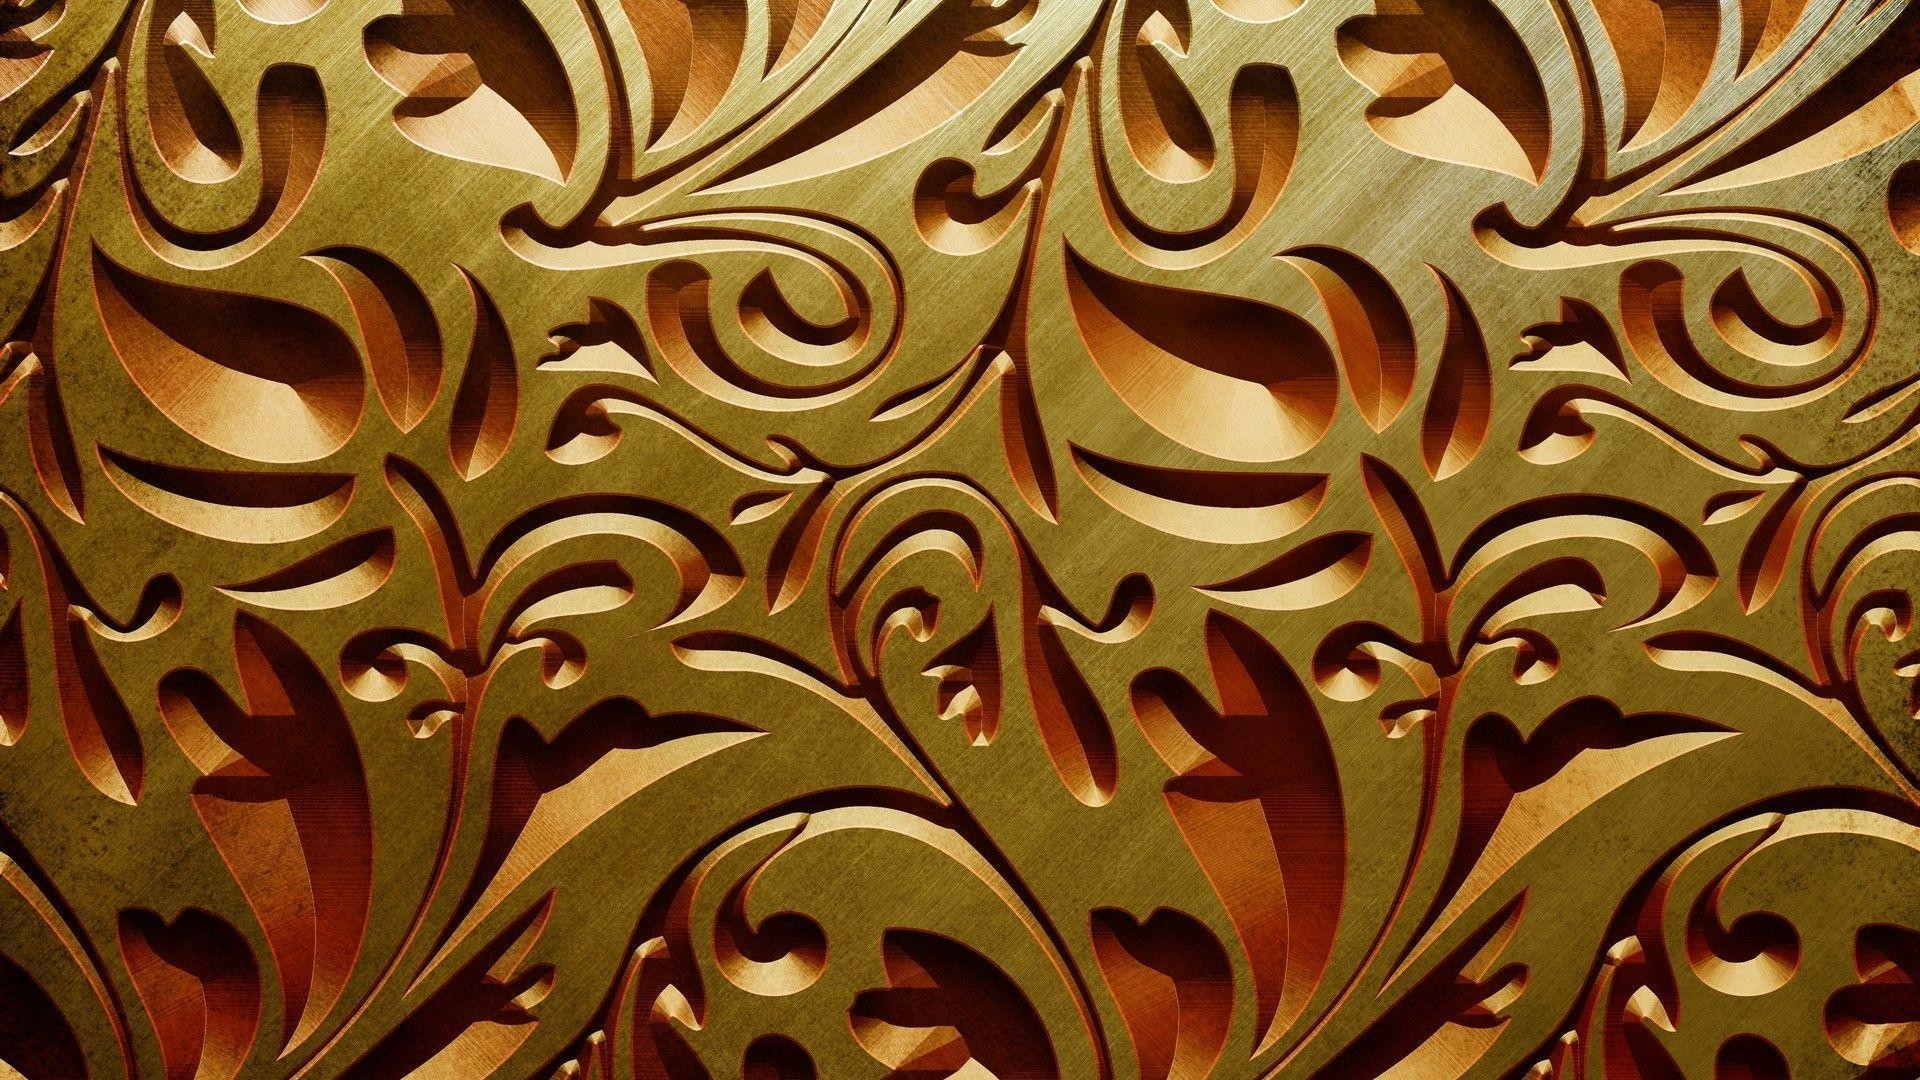 Texture Background wallpaper – 1137249